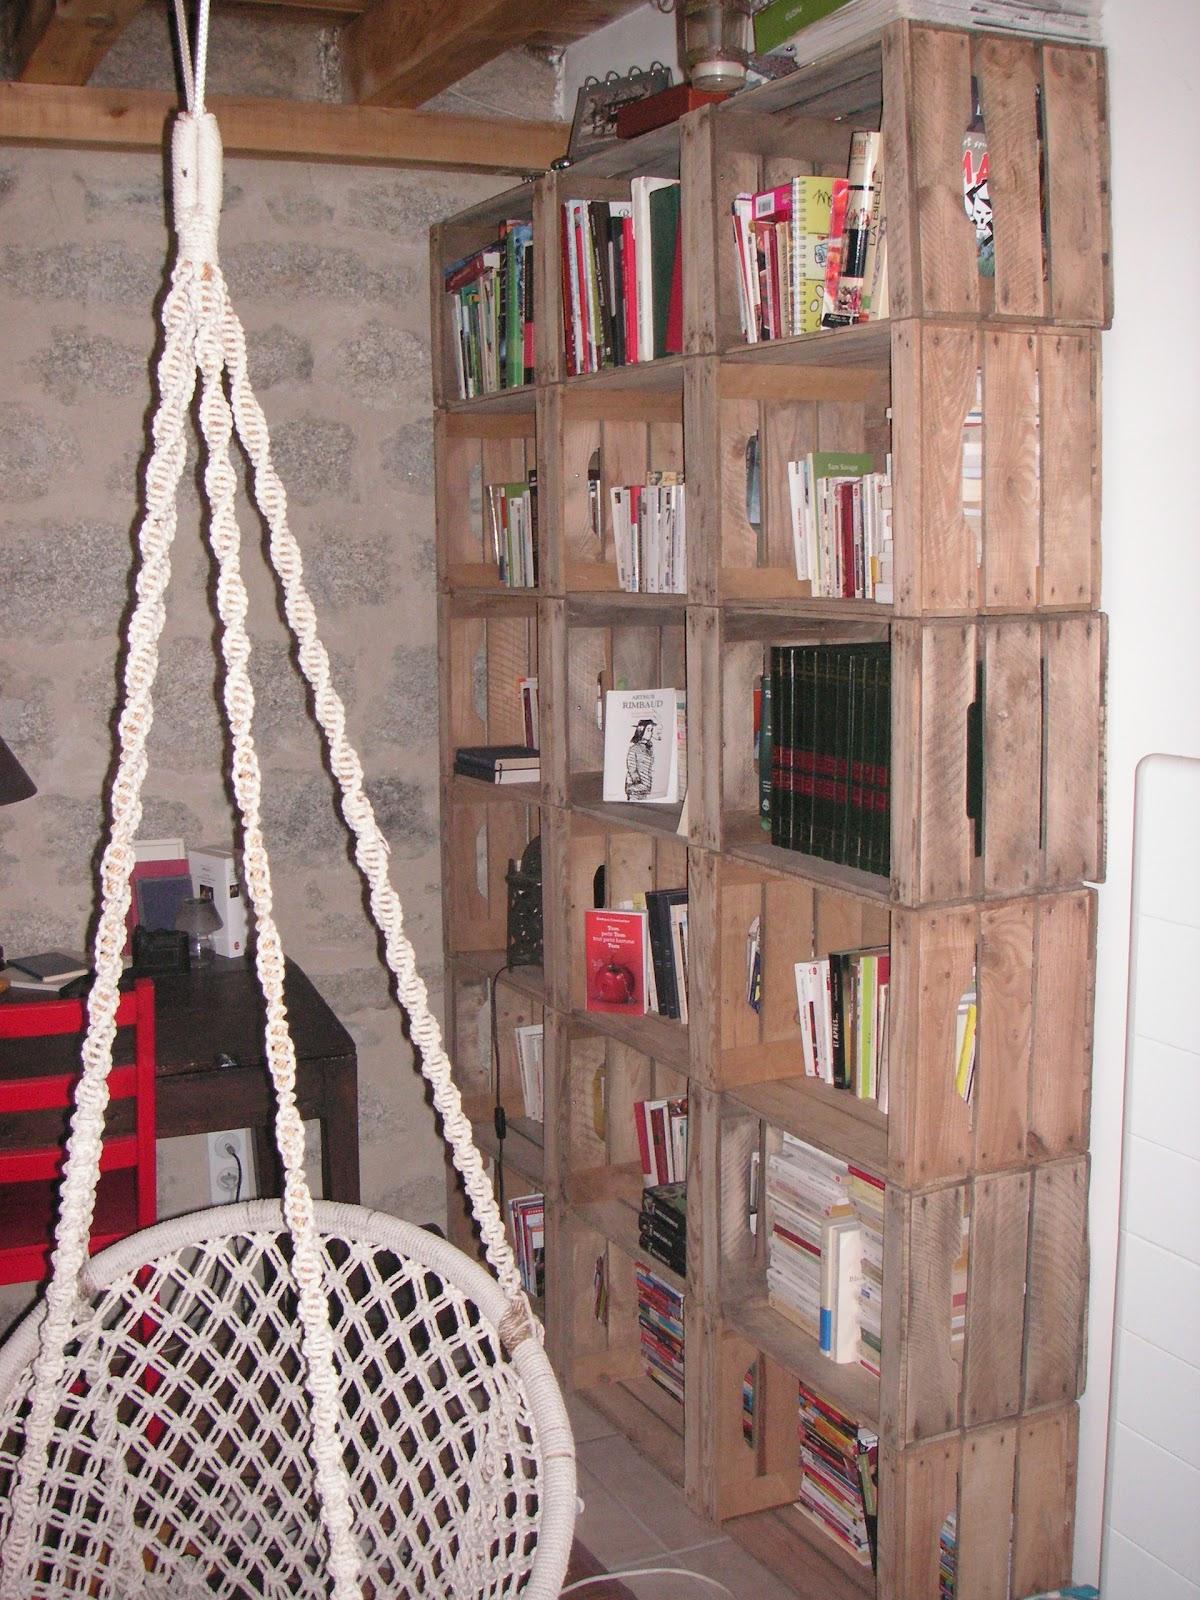 Retaper Une Vieille Caisse En Bois construire-retaper: caisses de pommes pom pom pom